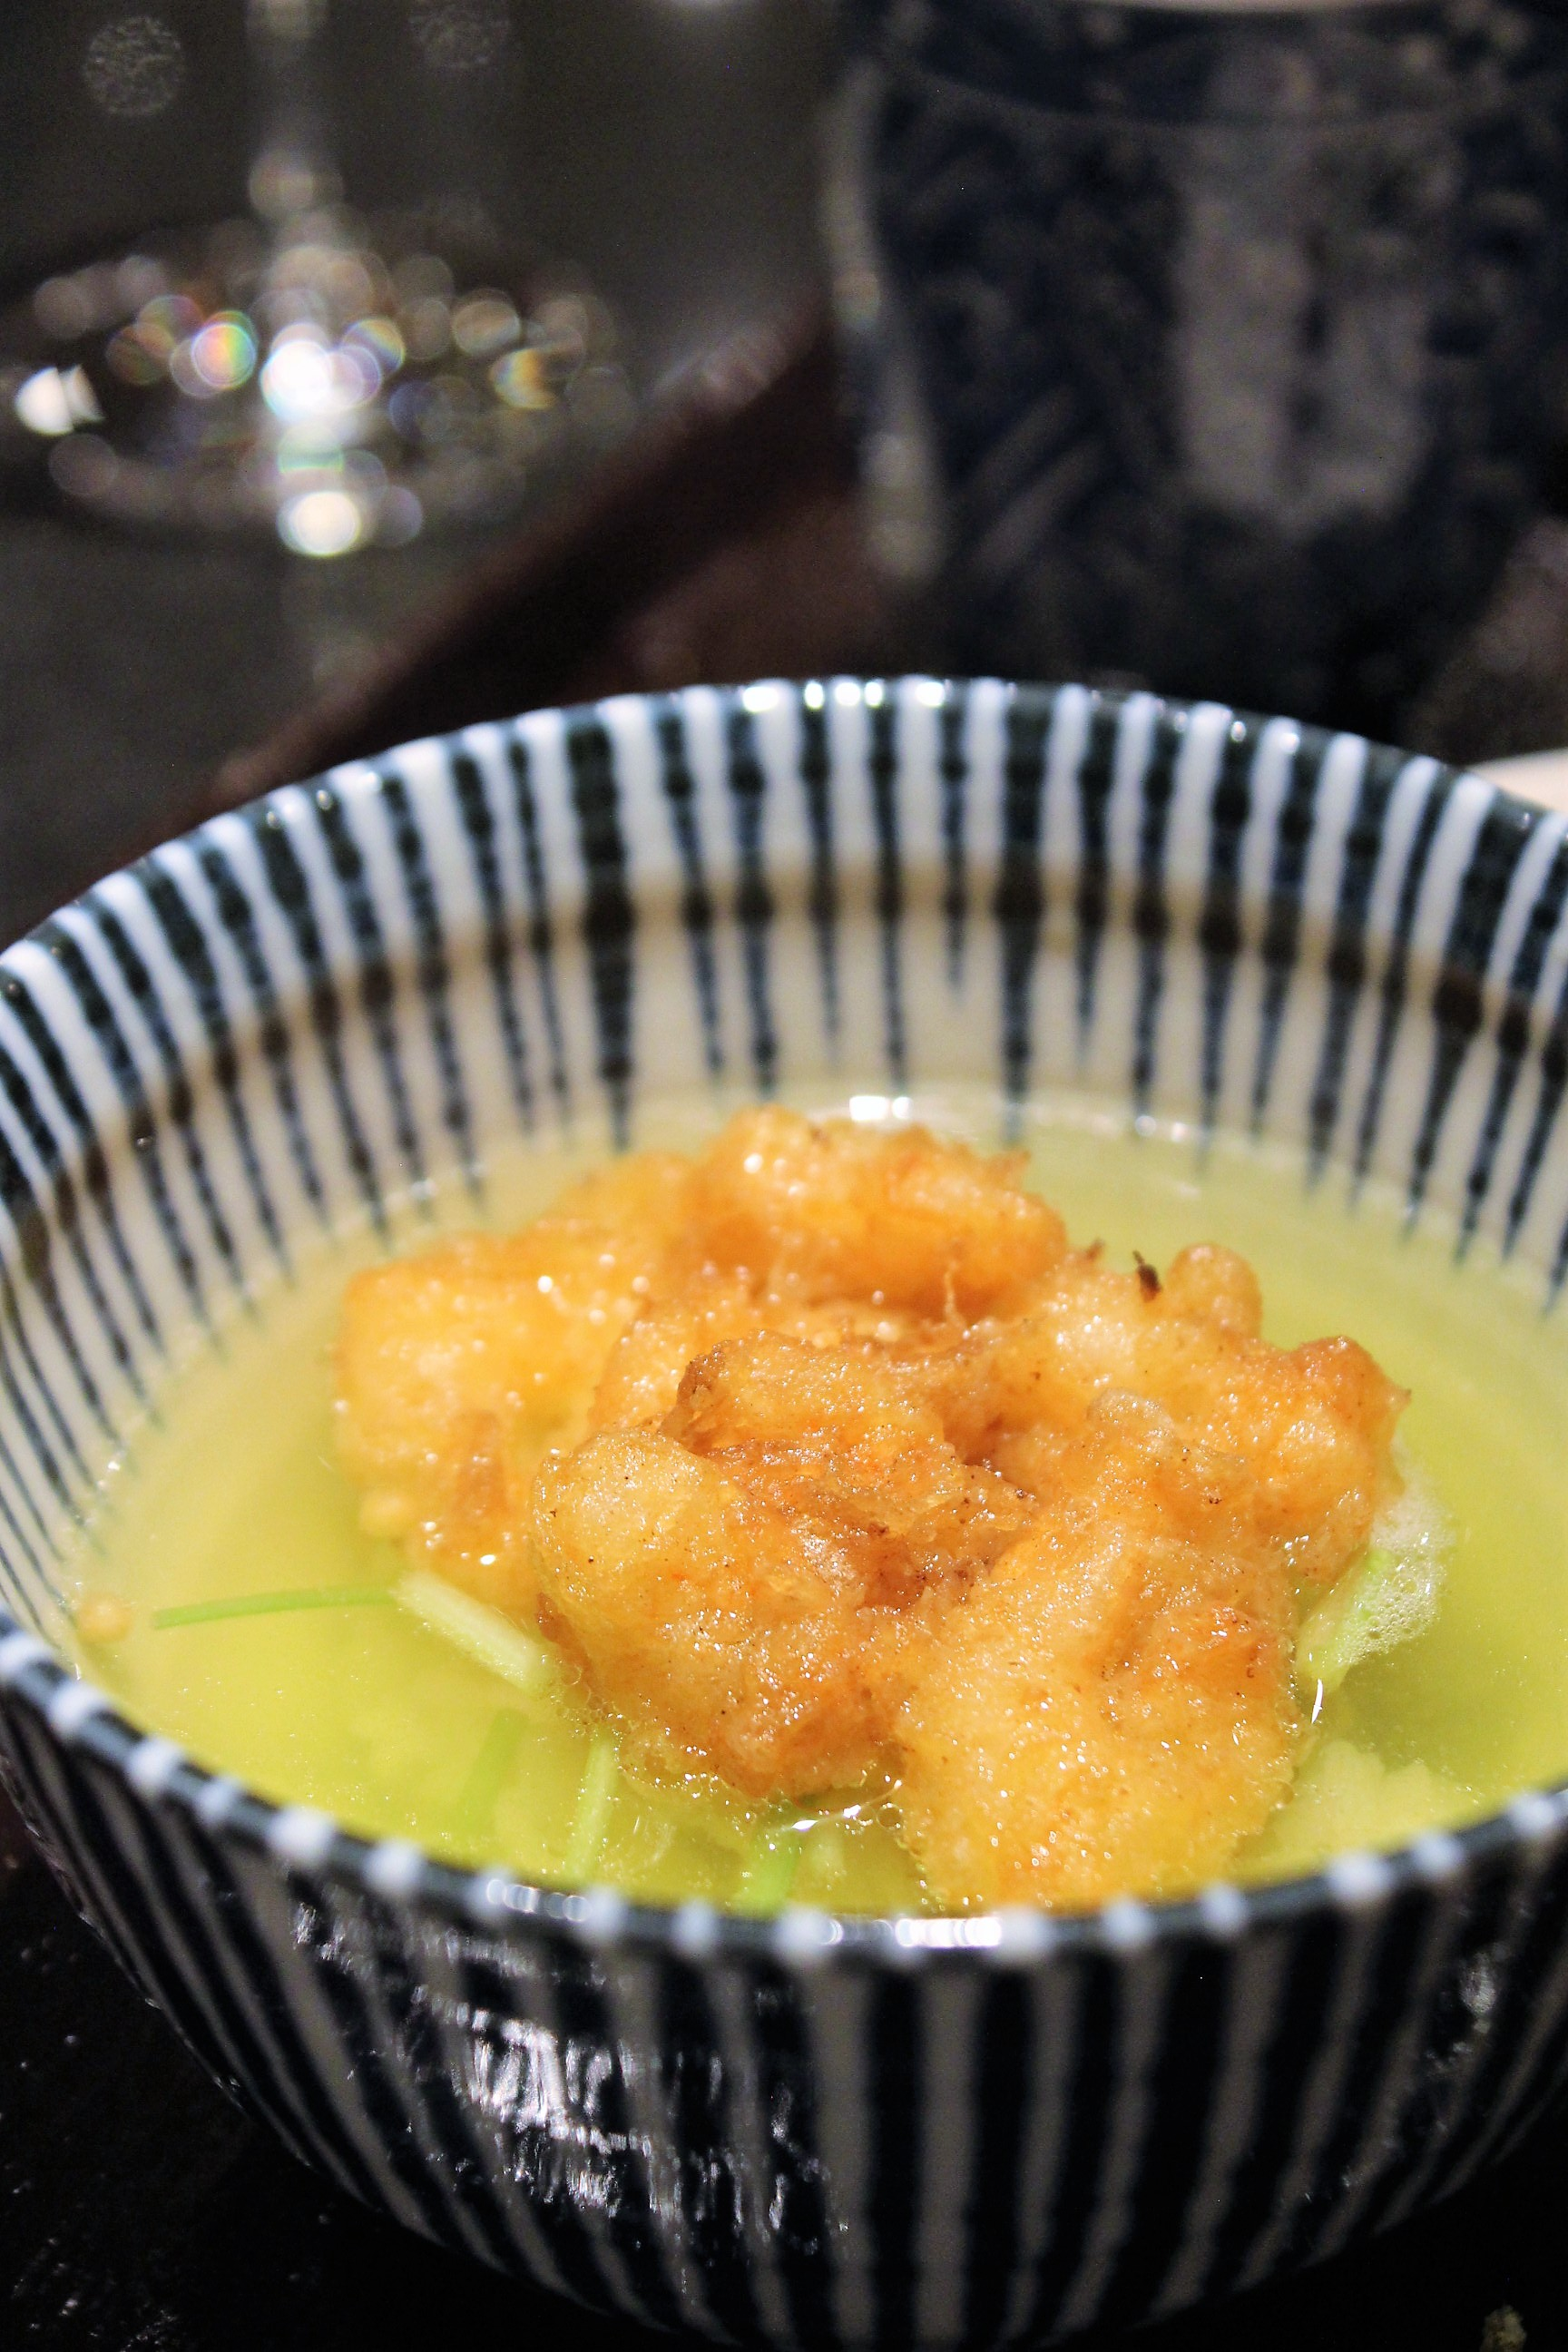 Ten-cha at Tempura Endo Yasaka